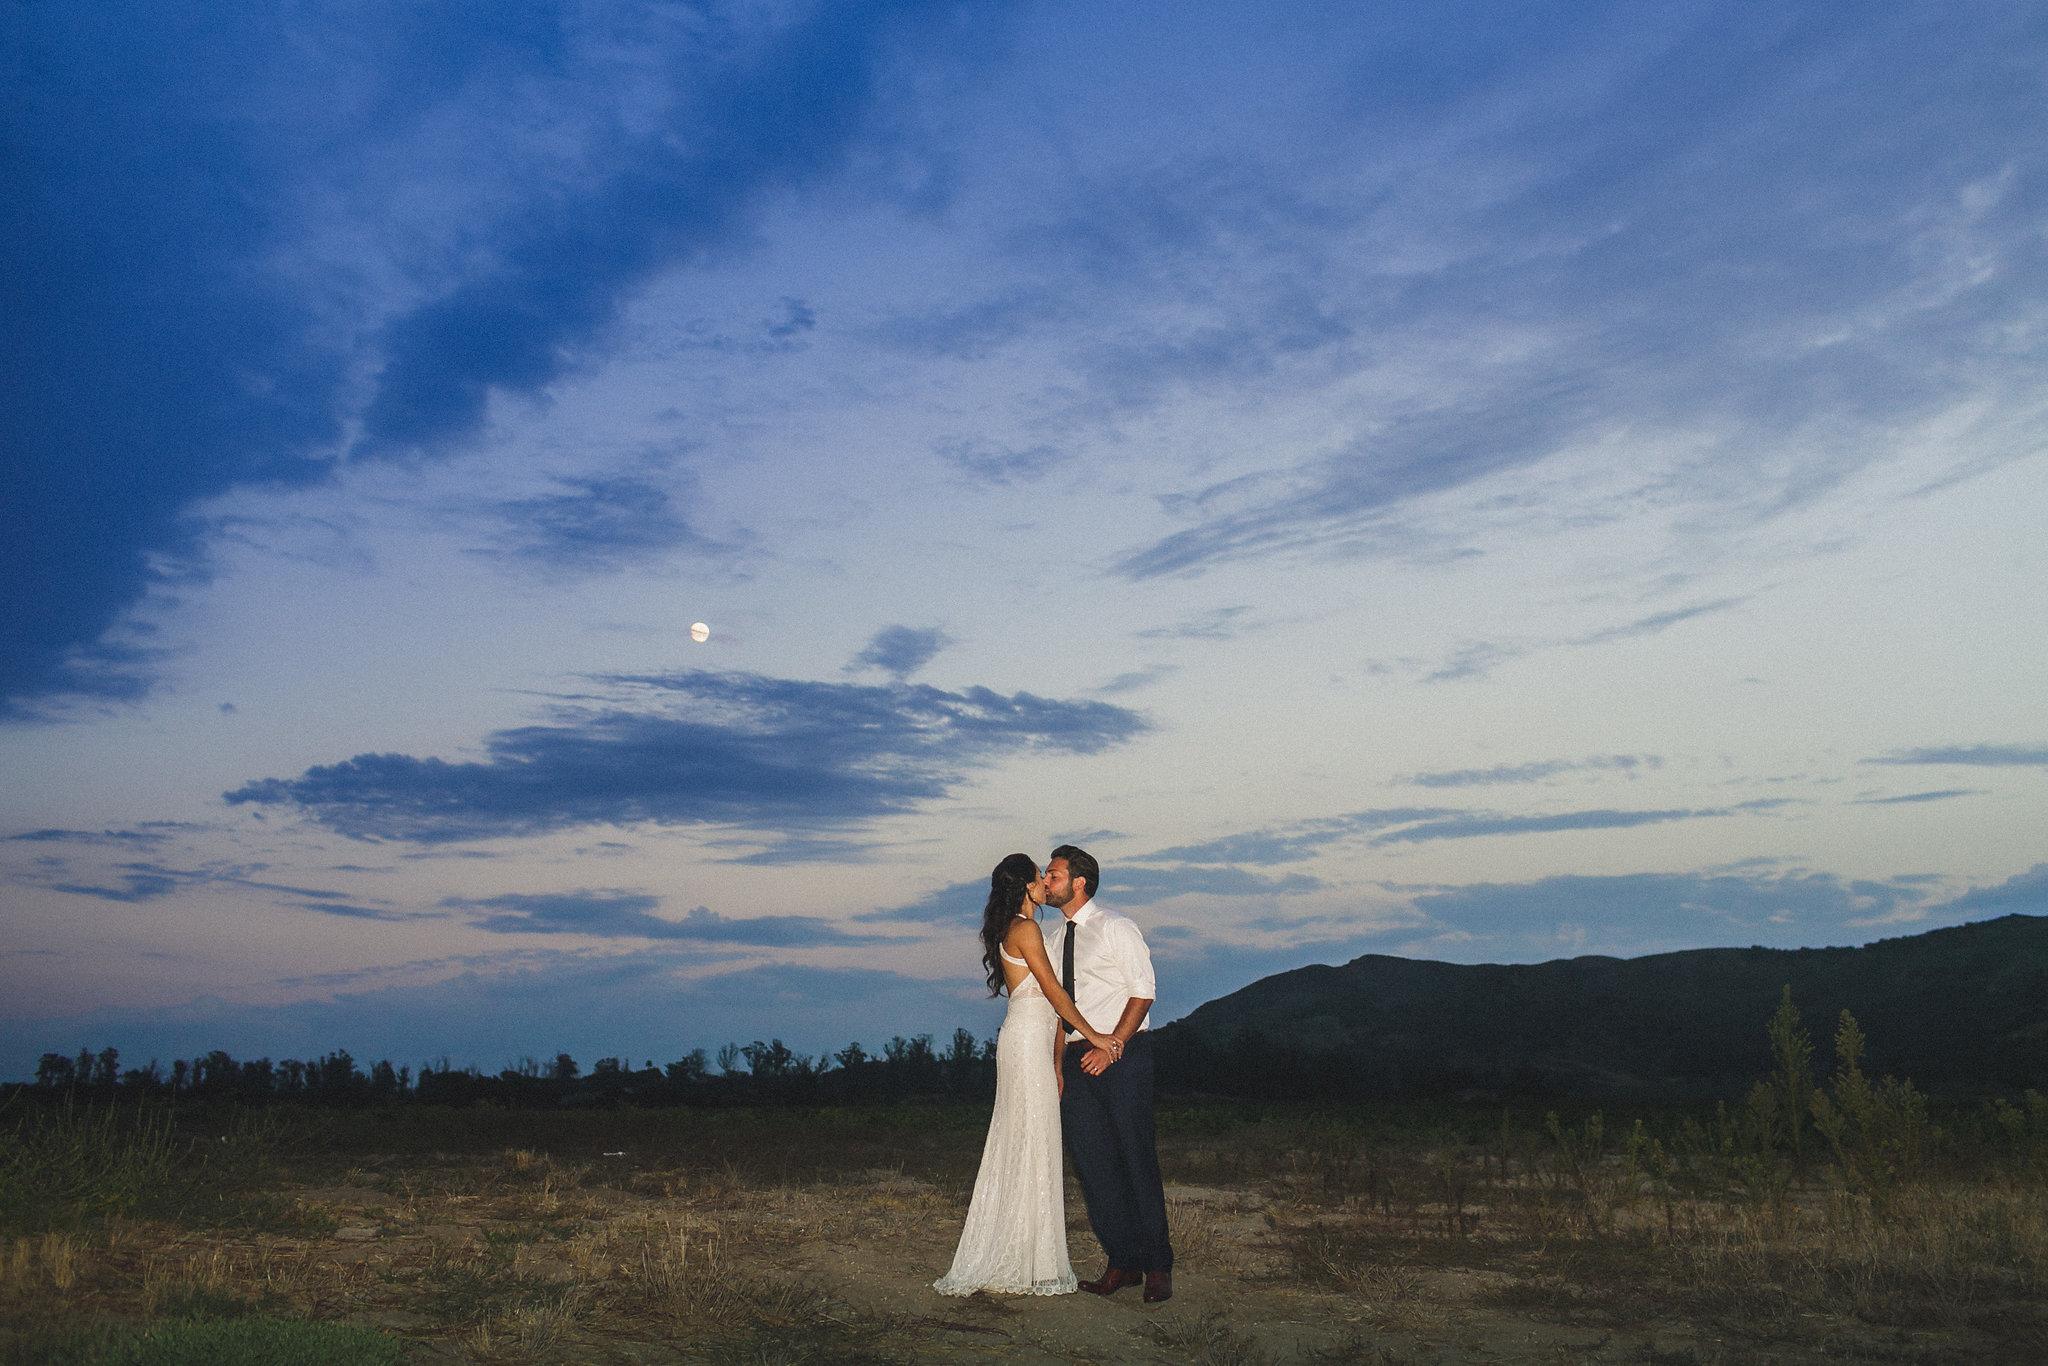 Cameron Ingalls Photography